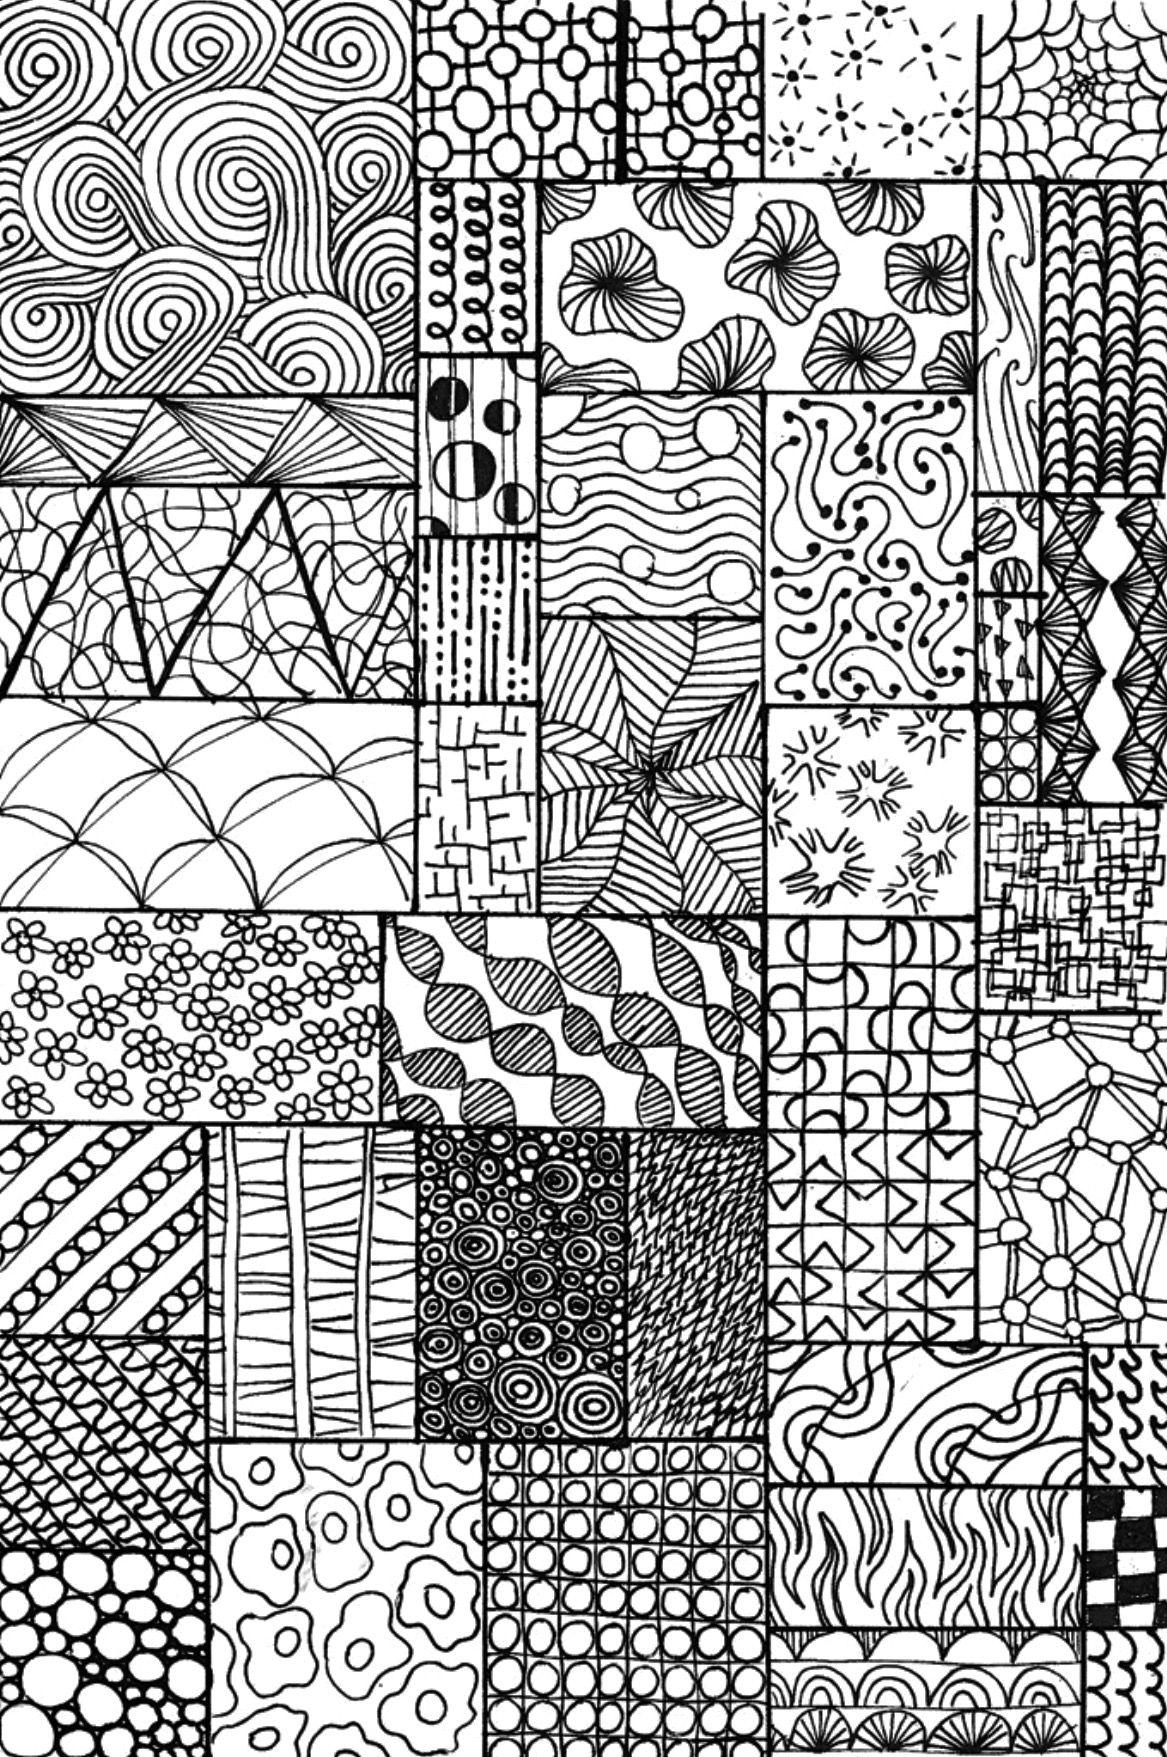 Zentangle Drawings By Catie Moran On *Zentangles